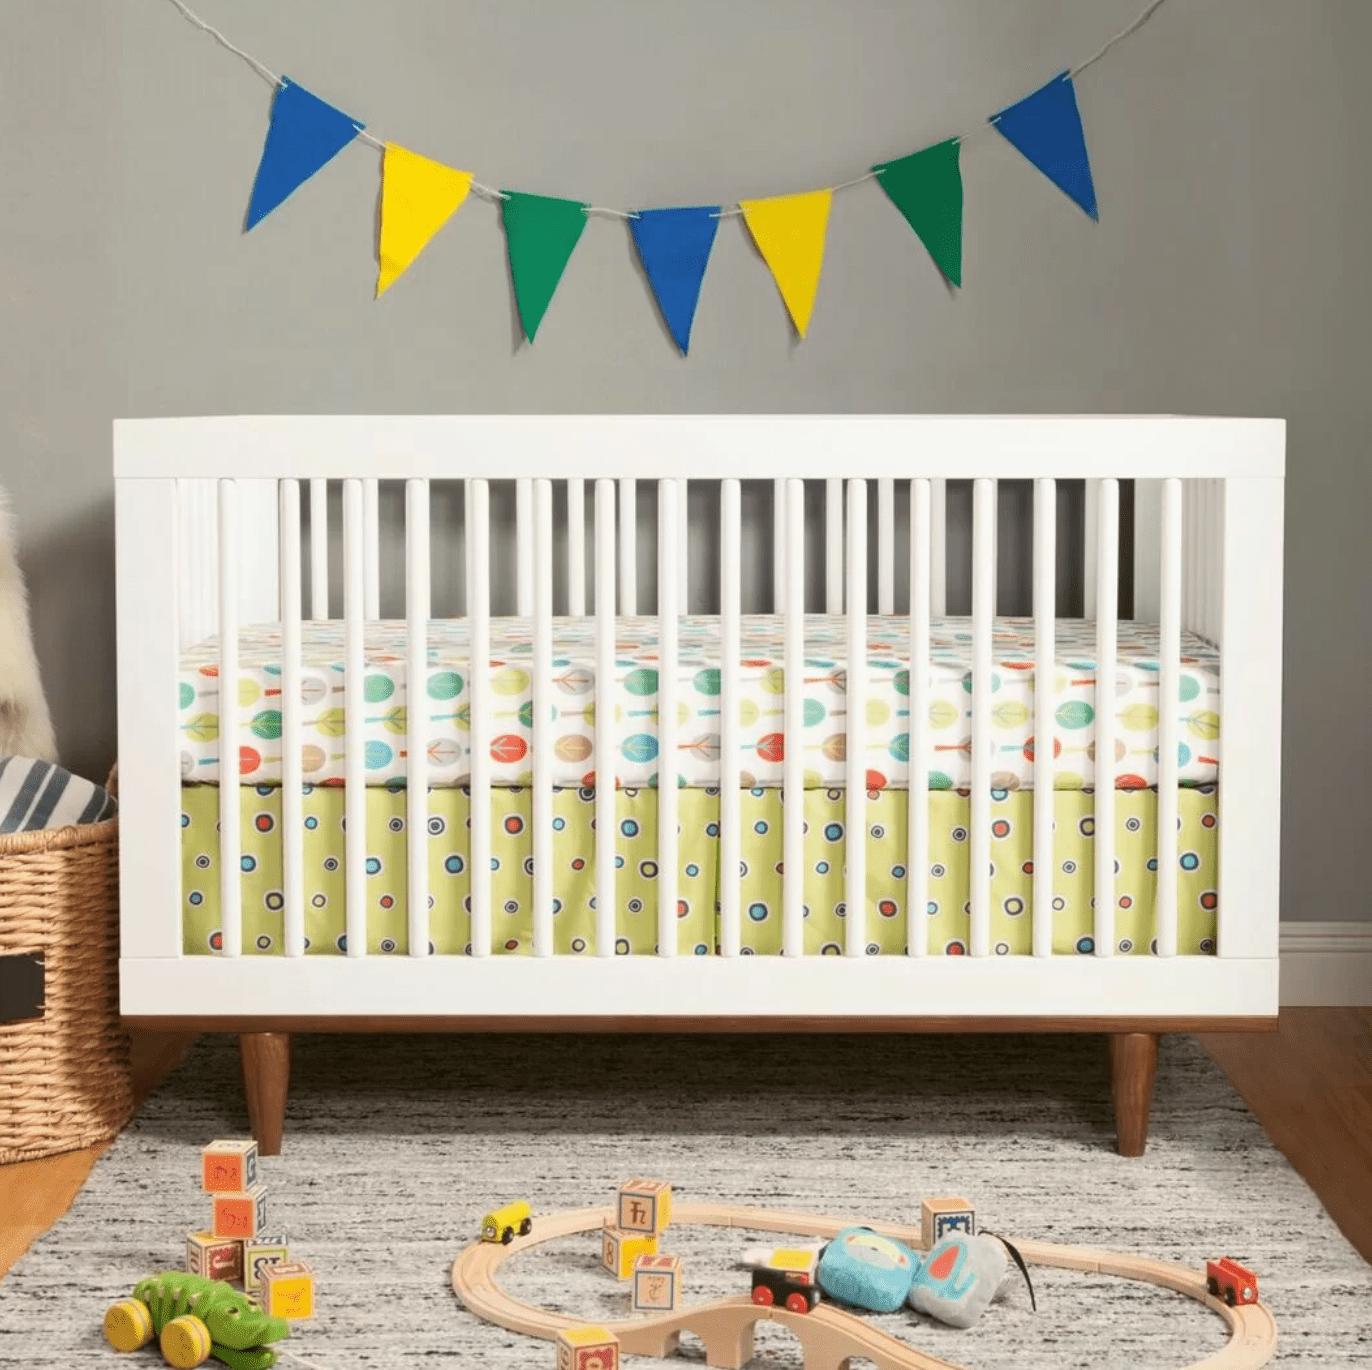 Baby Mod Marley 3-in-1 Convertible Crib